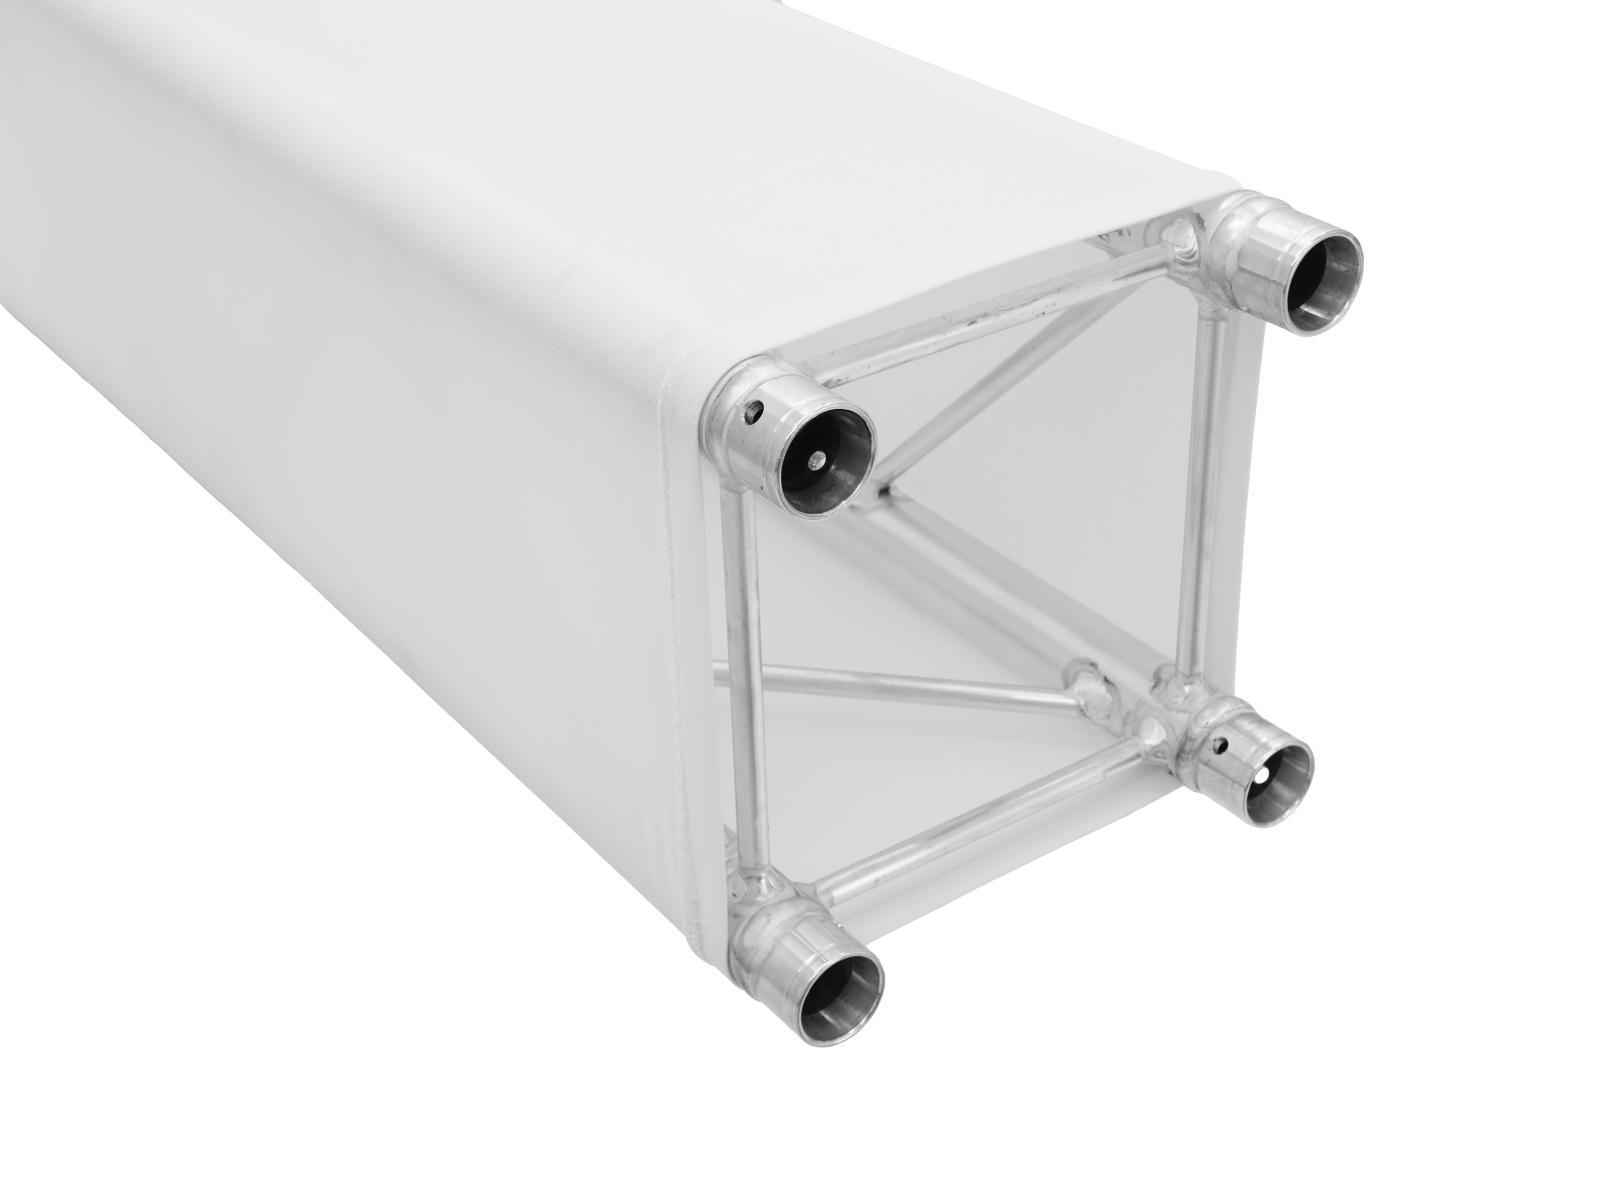 ESPANDERE Trusscover für Decolock 300cm bianco